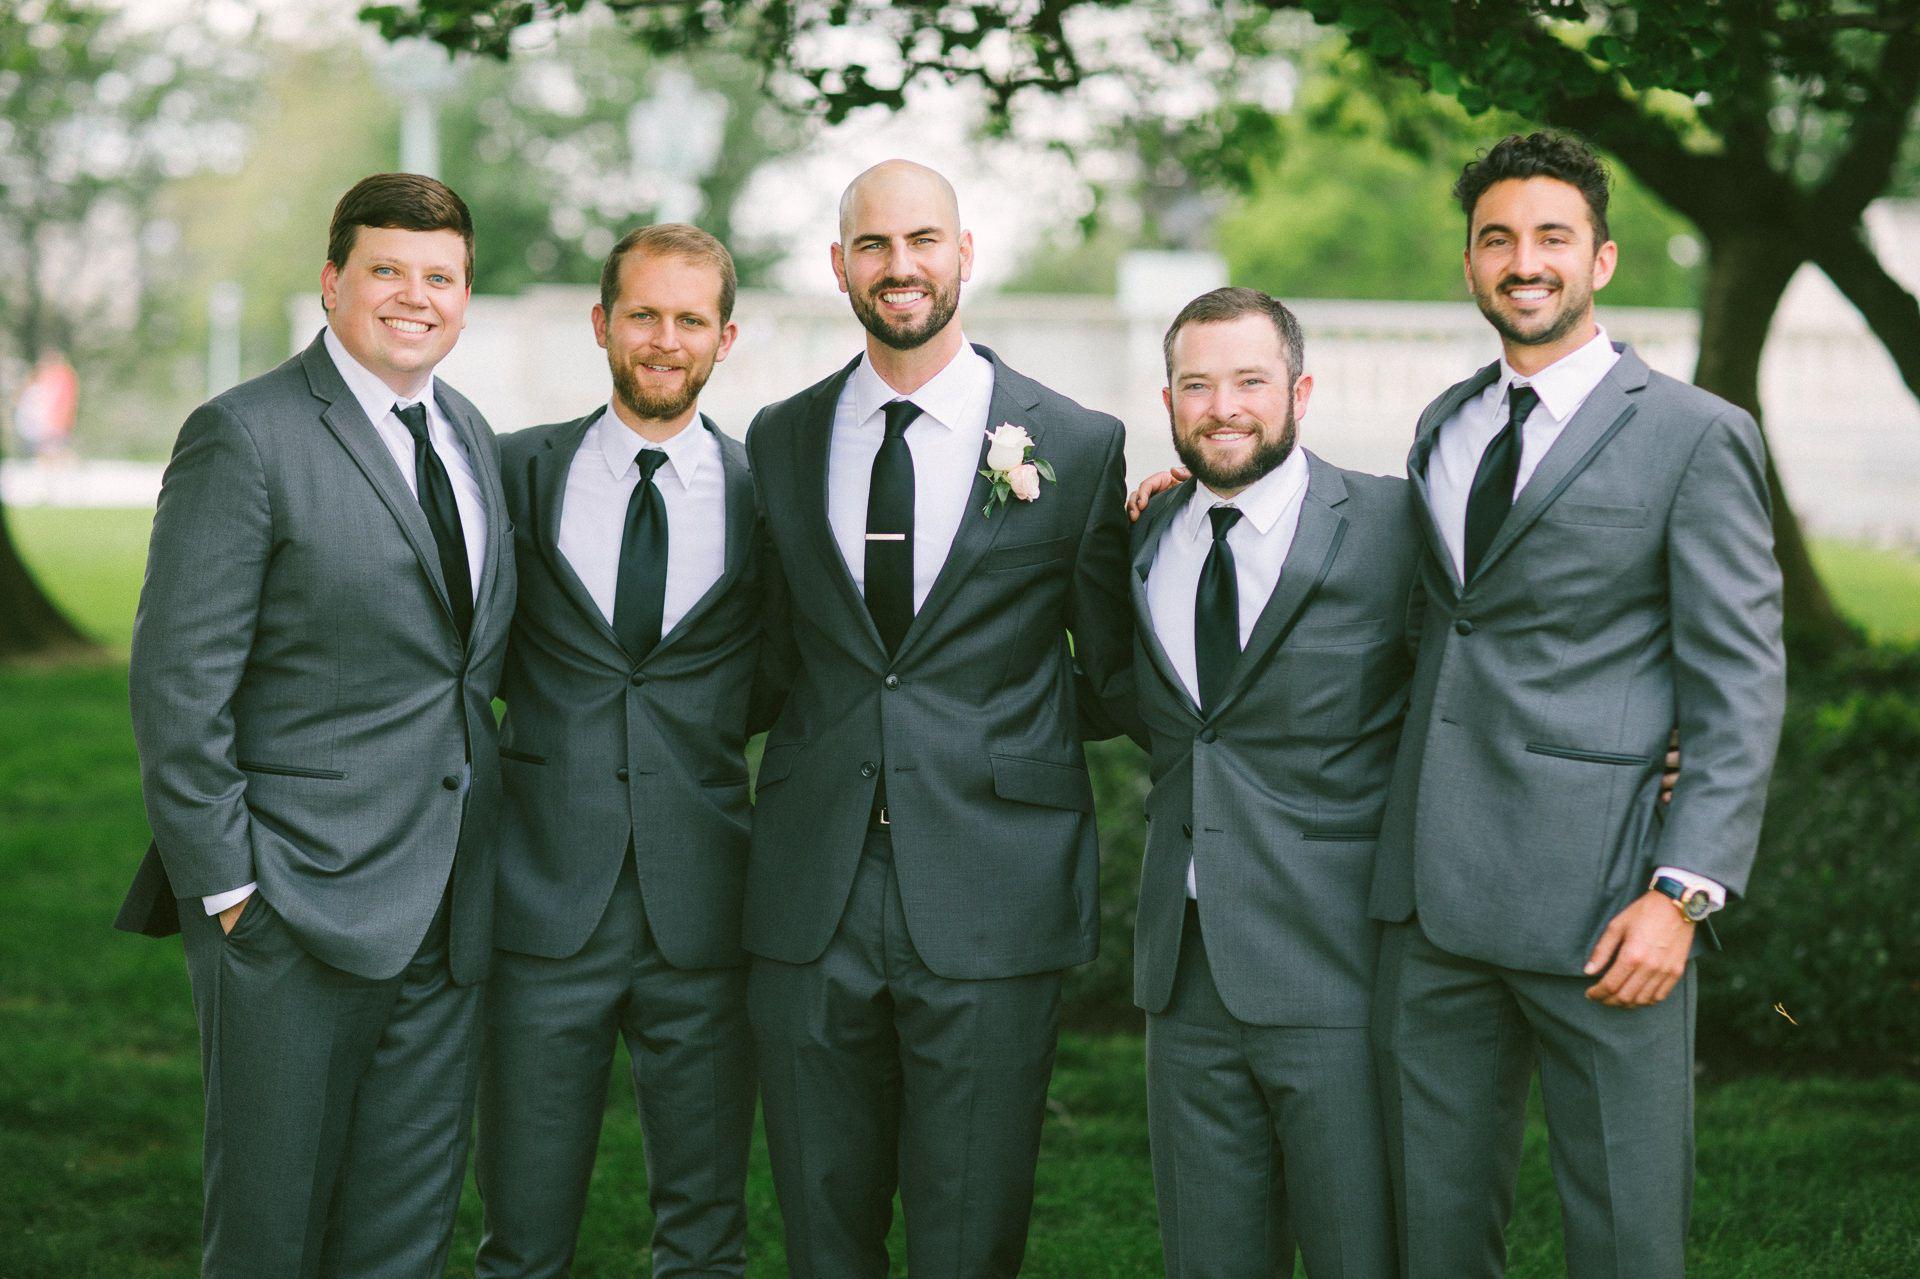 Dowtown Hilton Cleveland Wedding Photographer 1 40.jpg